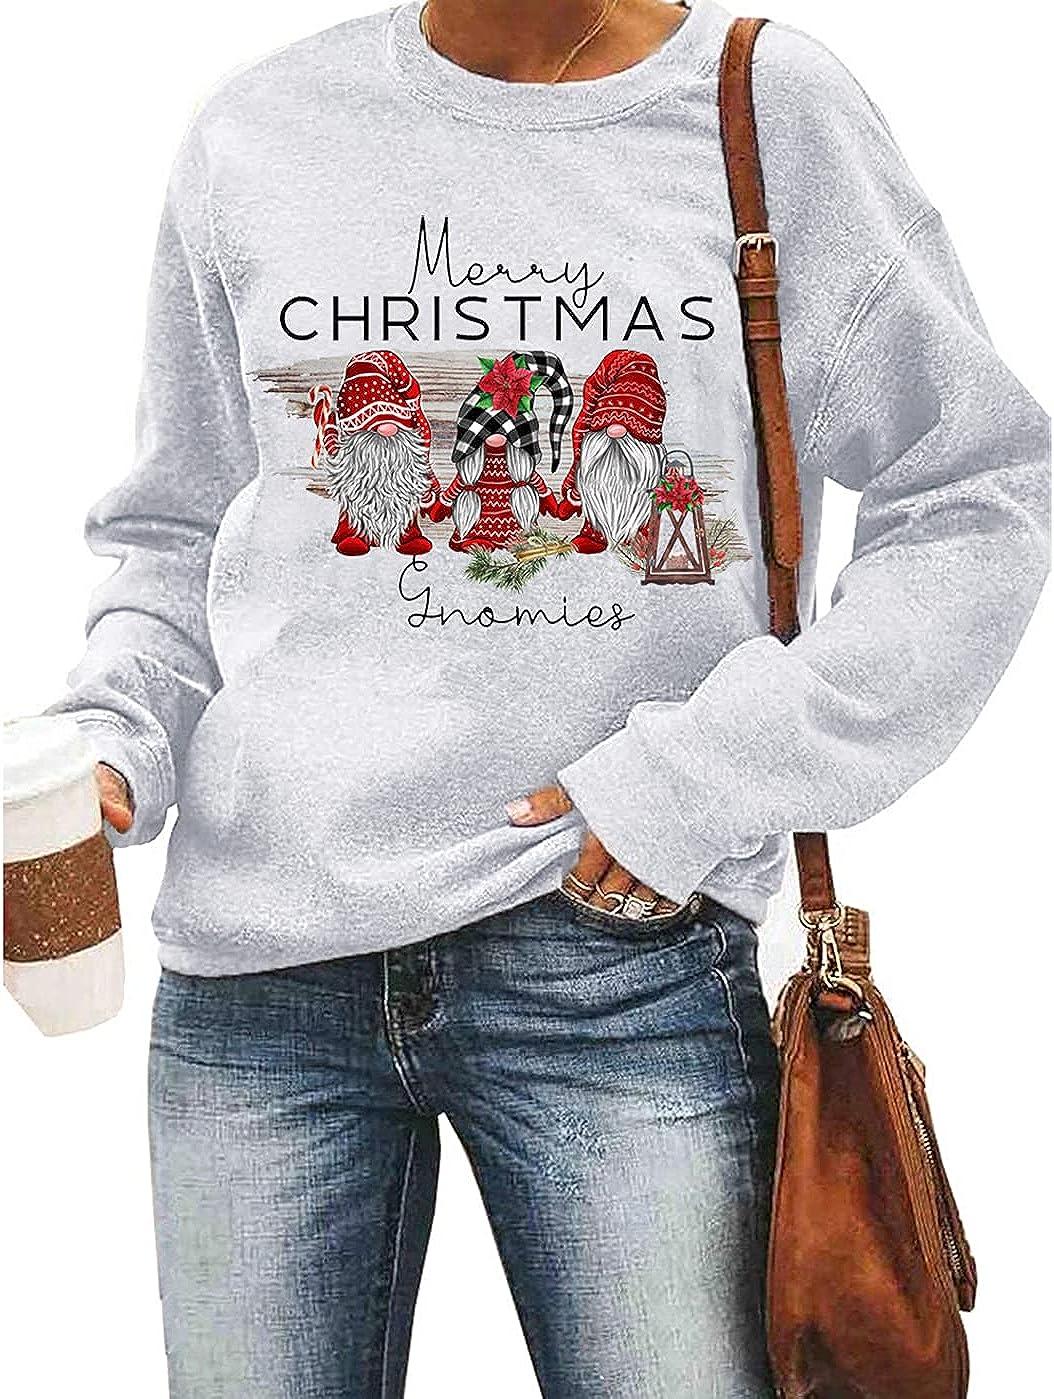 Women Merry Christmas Sweatshirt Long Sleeve Funny Buffalo Plaid Leopard Print Christmas Trees Graphic Pullover Tops Blouse